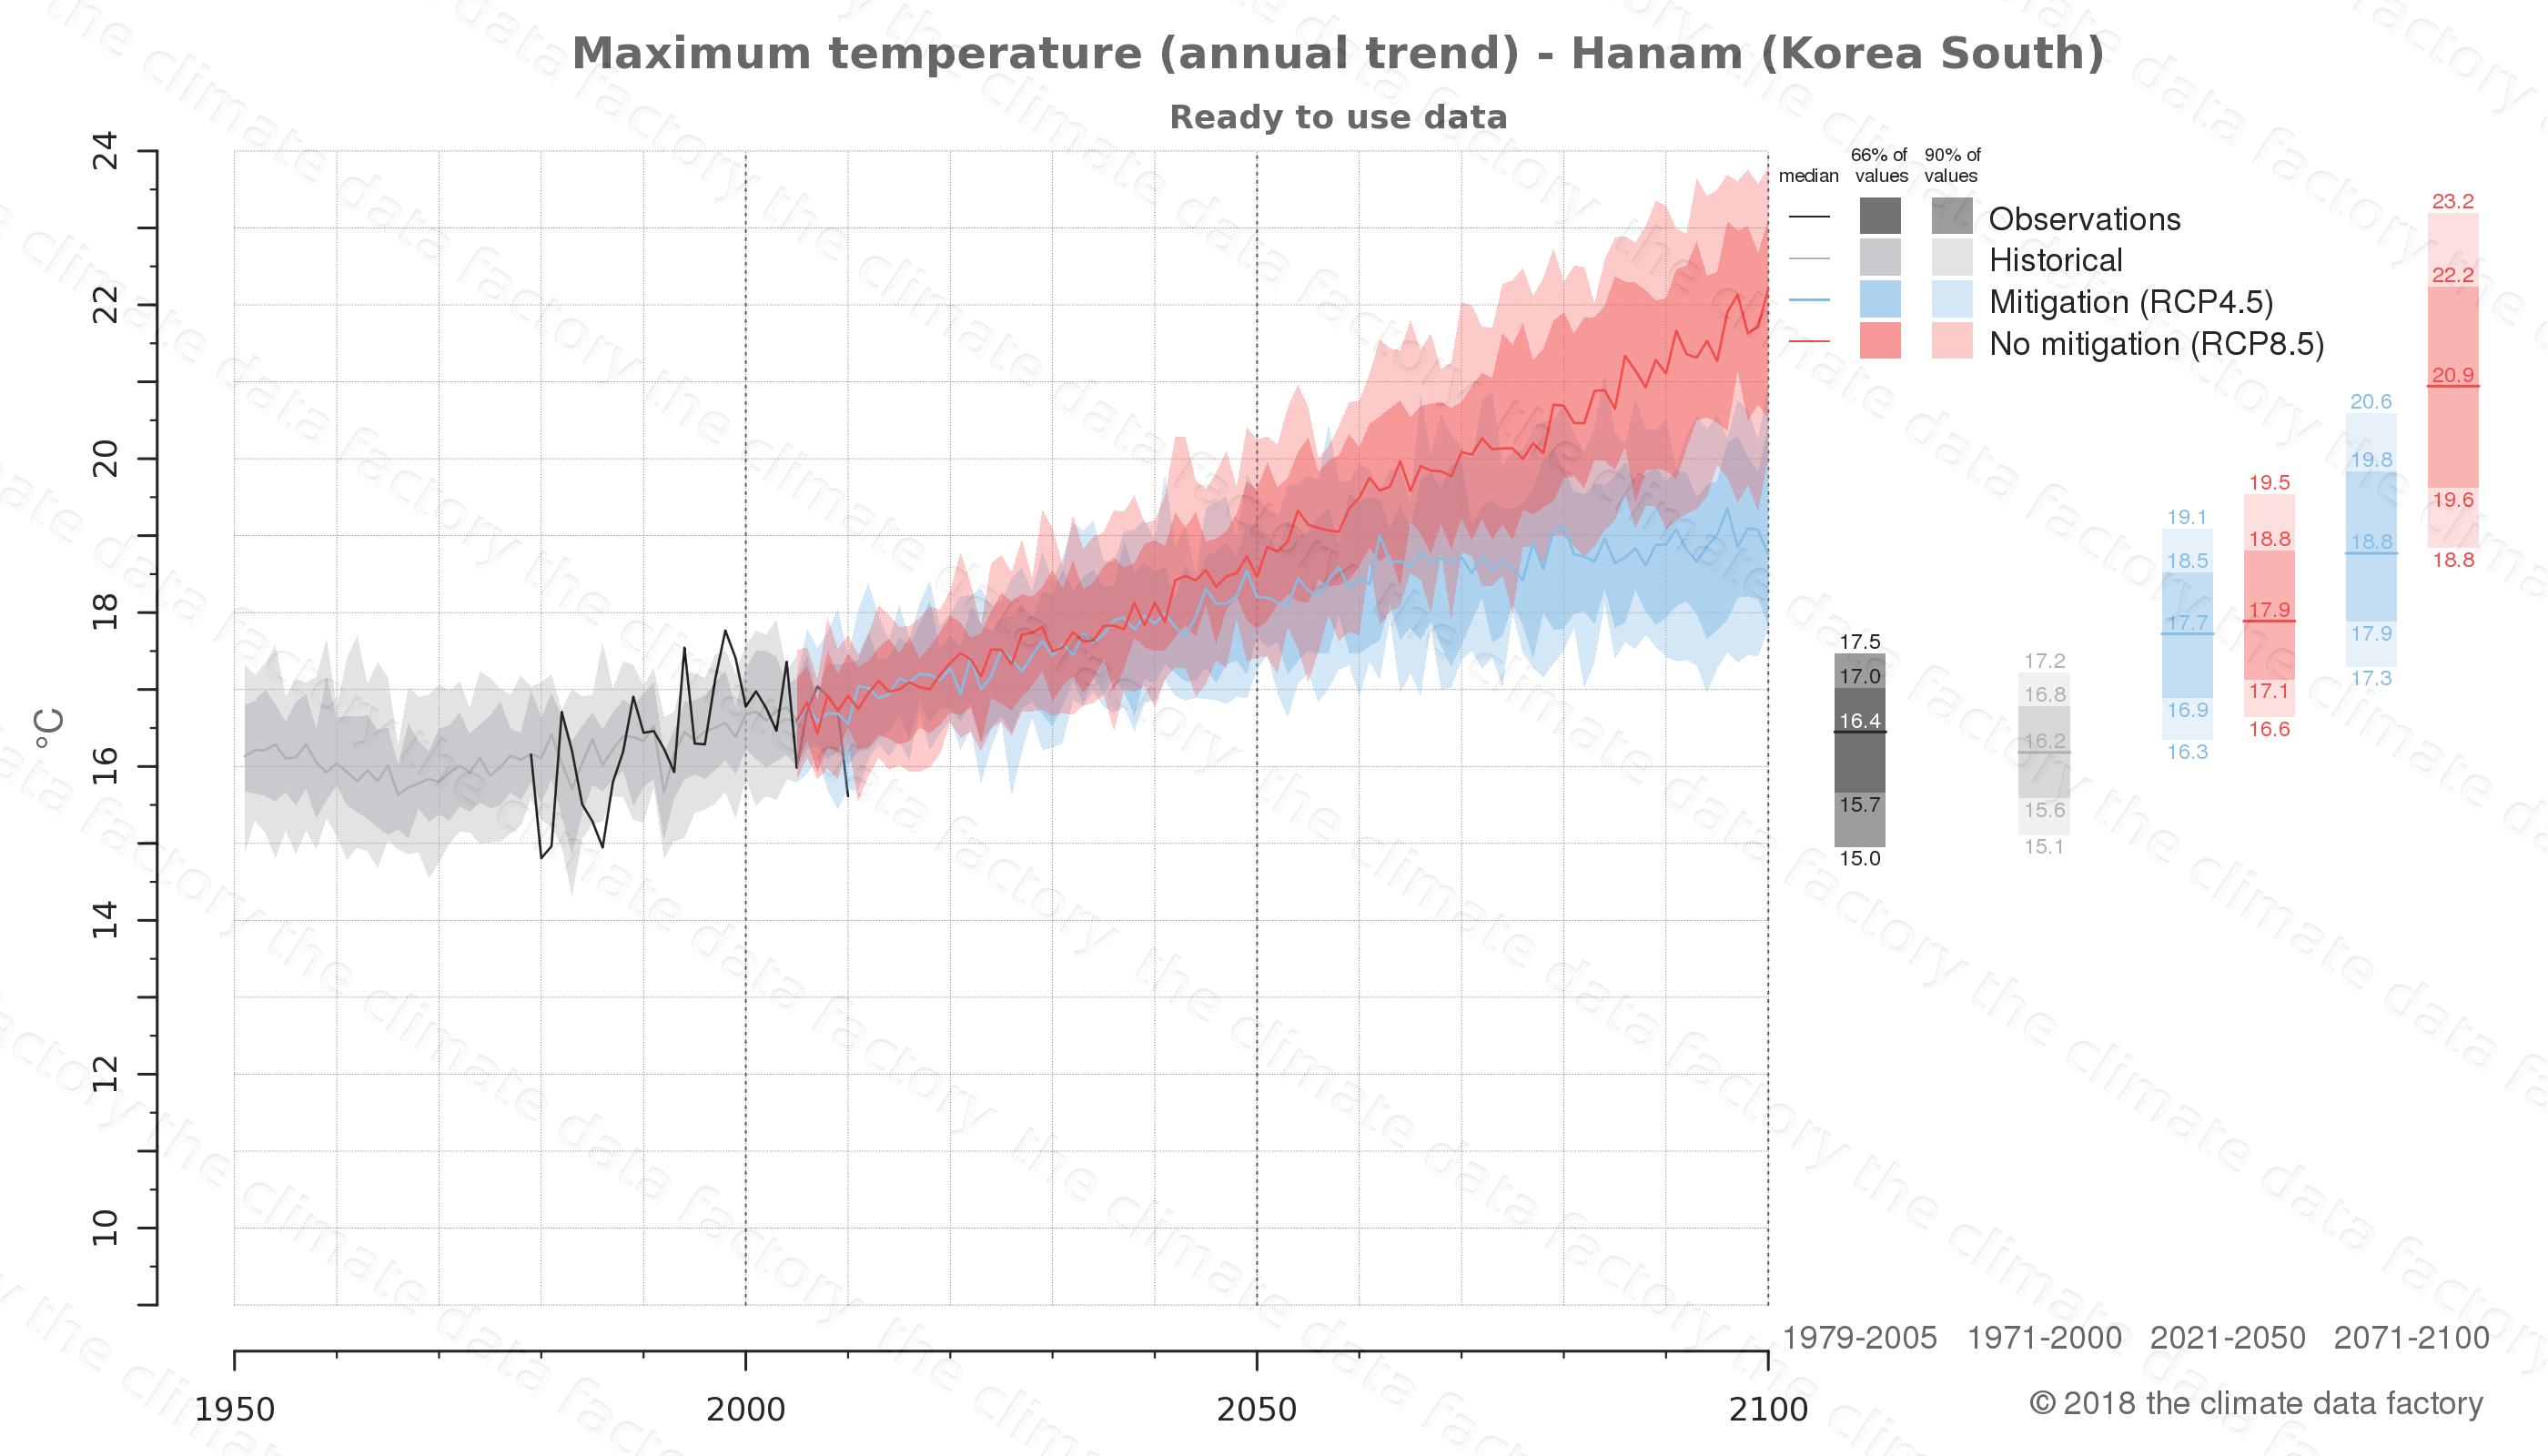 climate change data policy adaptation climate graph city data maximum-temperature hanam south korea